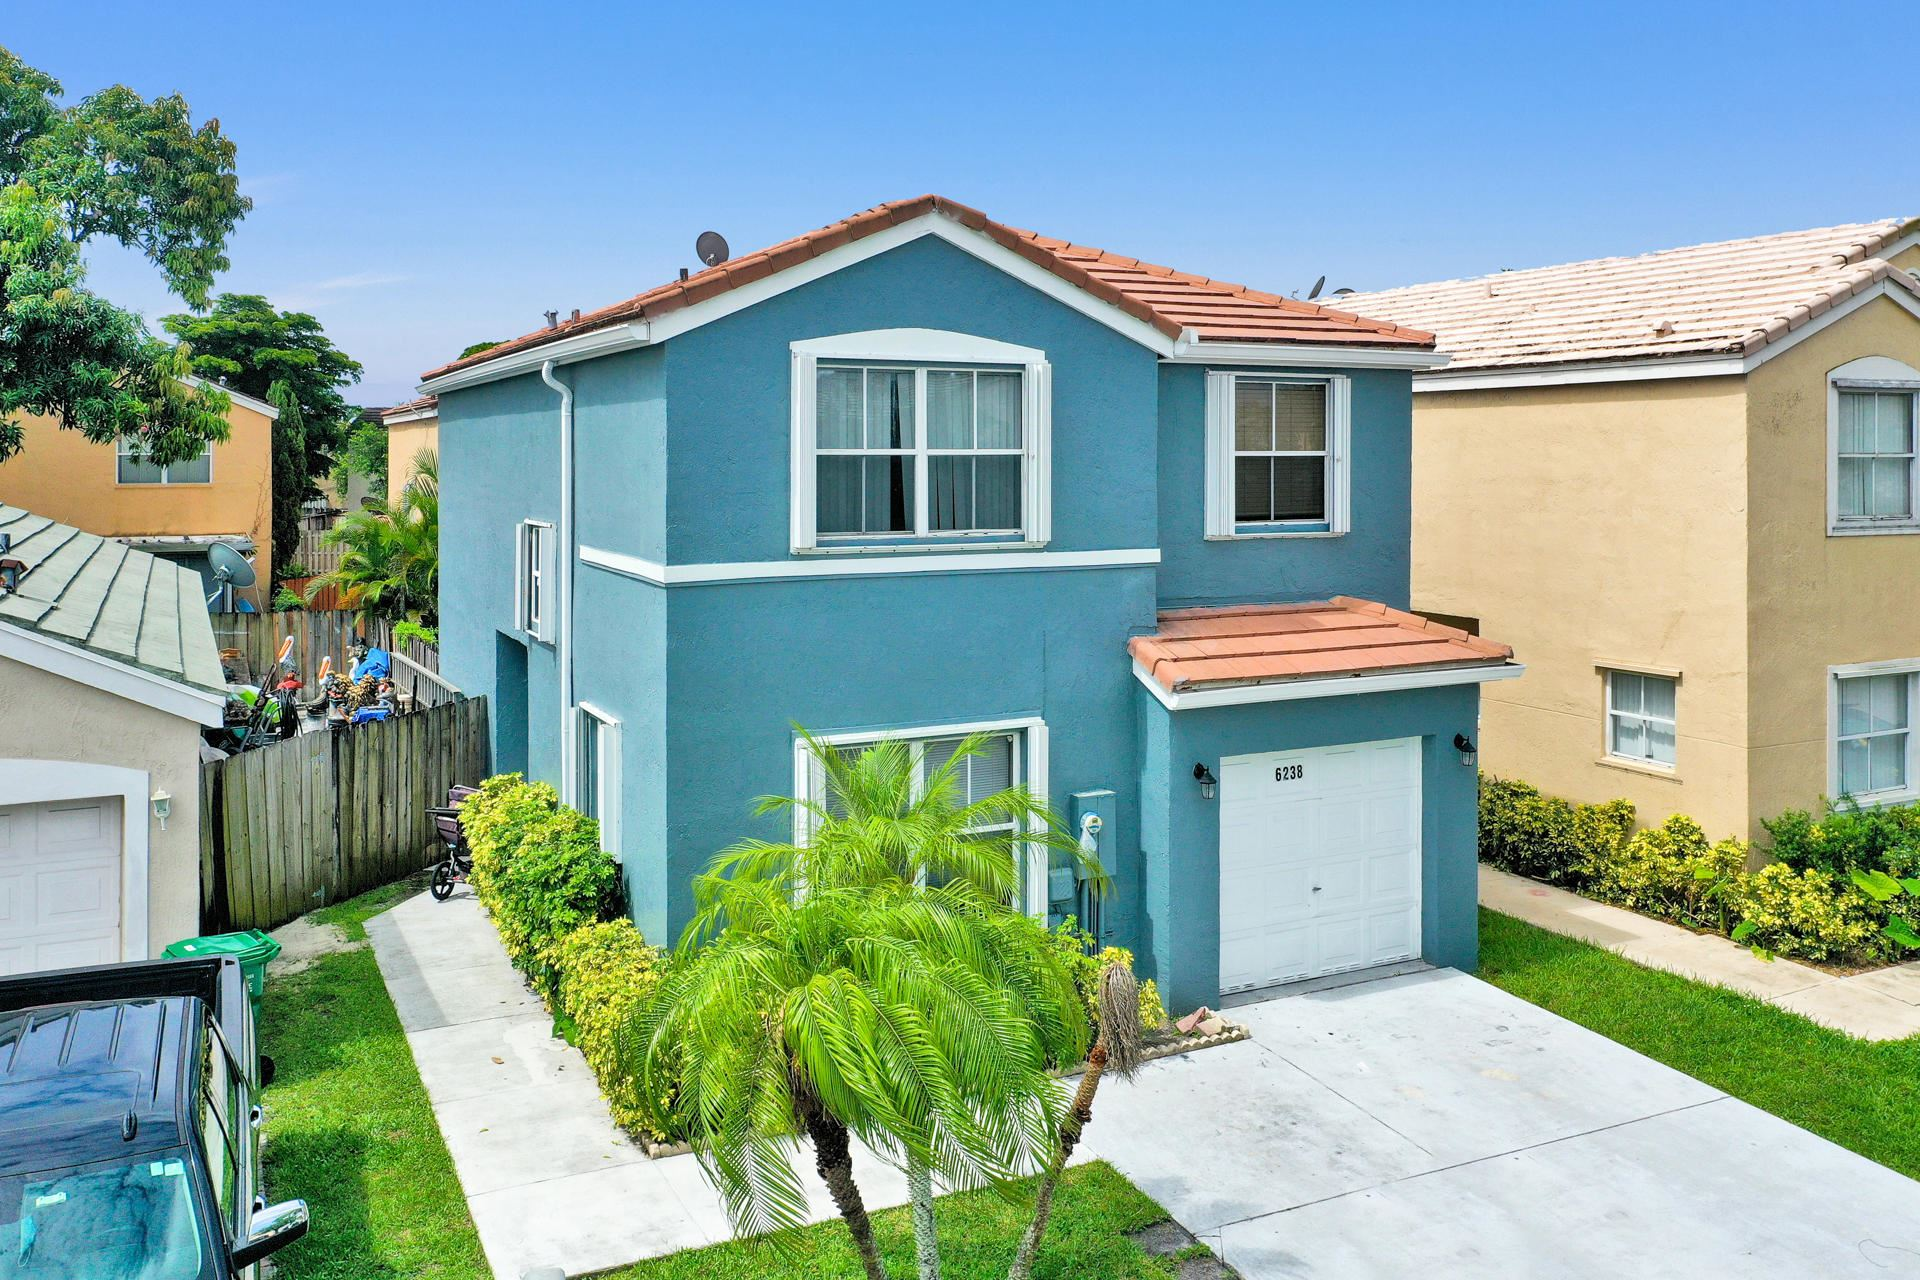 6238 Navajo Terrace, Margate, FL 33063 - #: RX-10629983